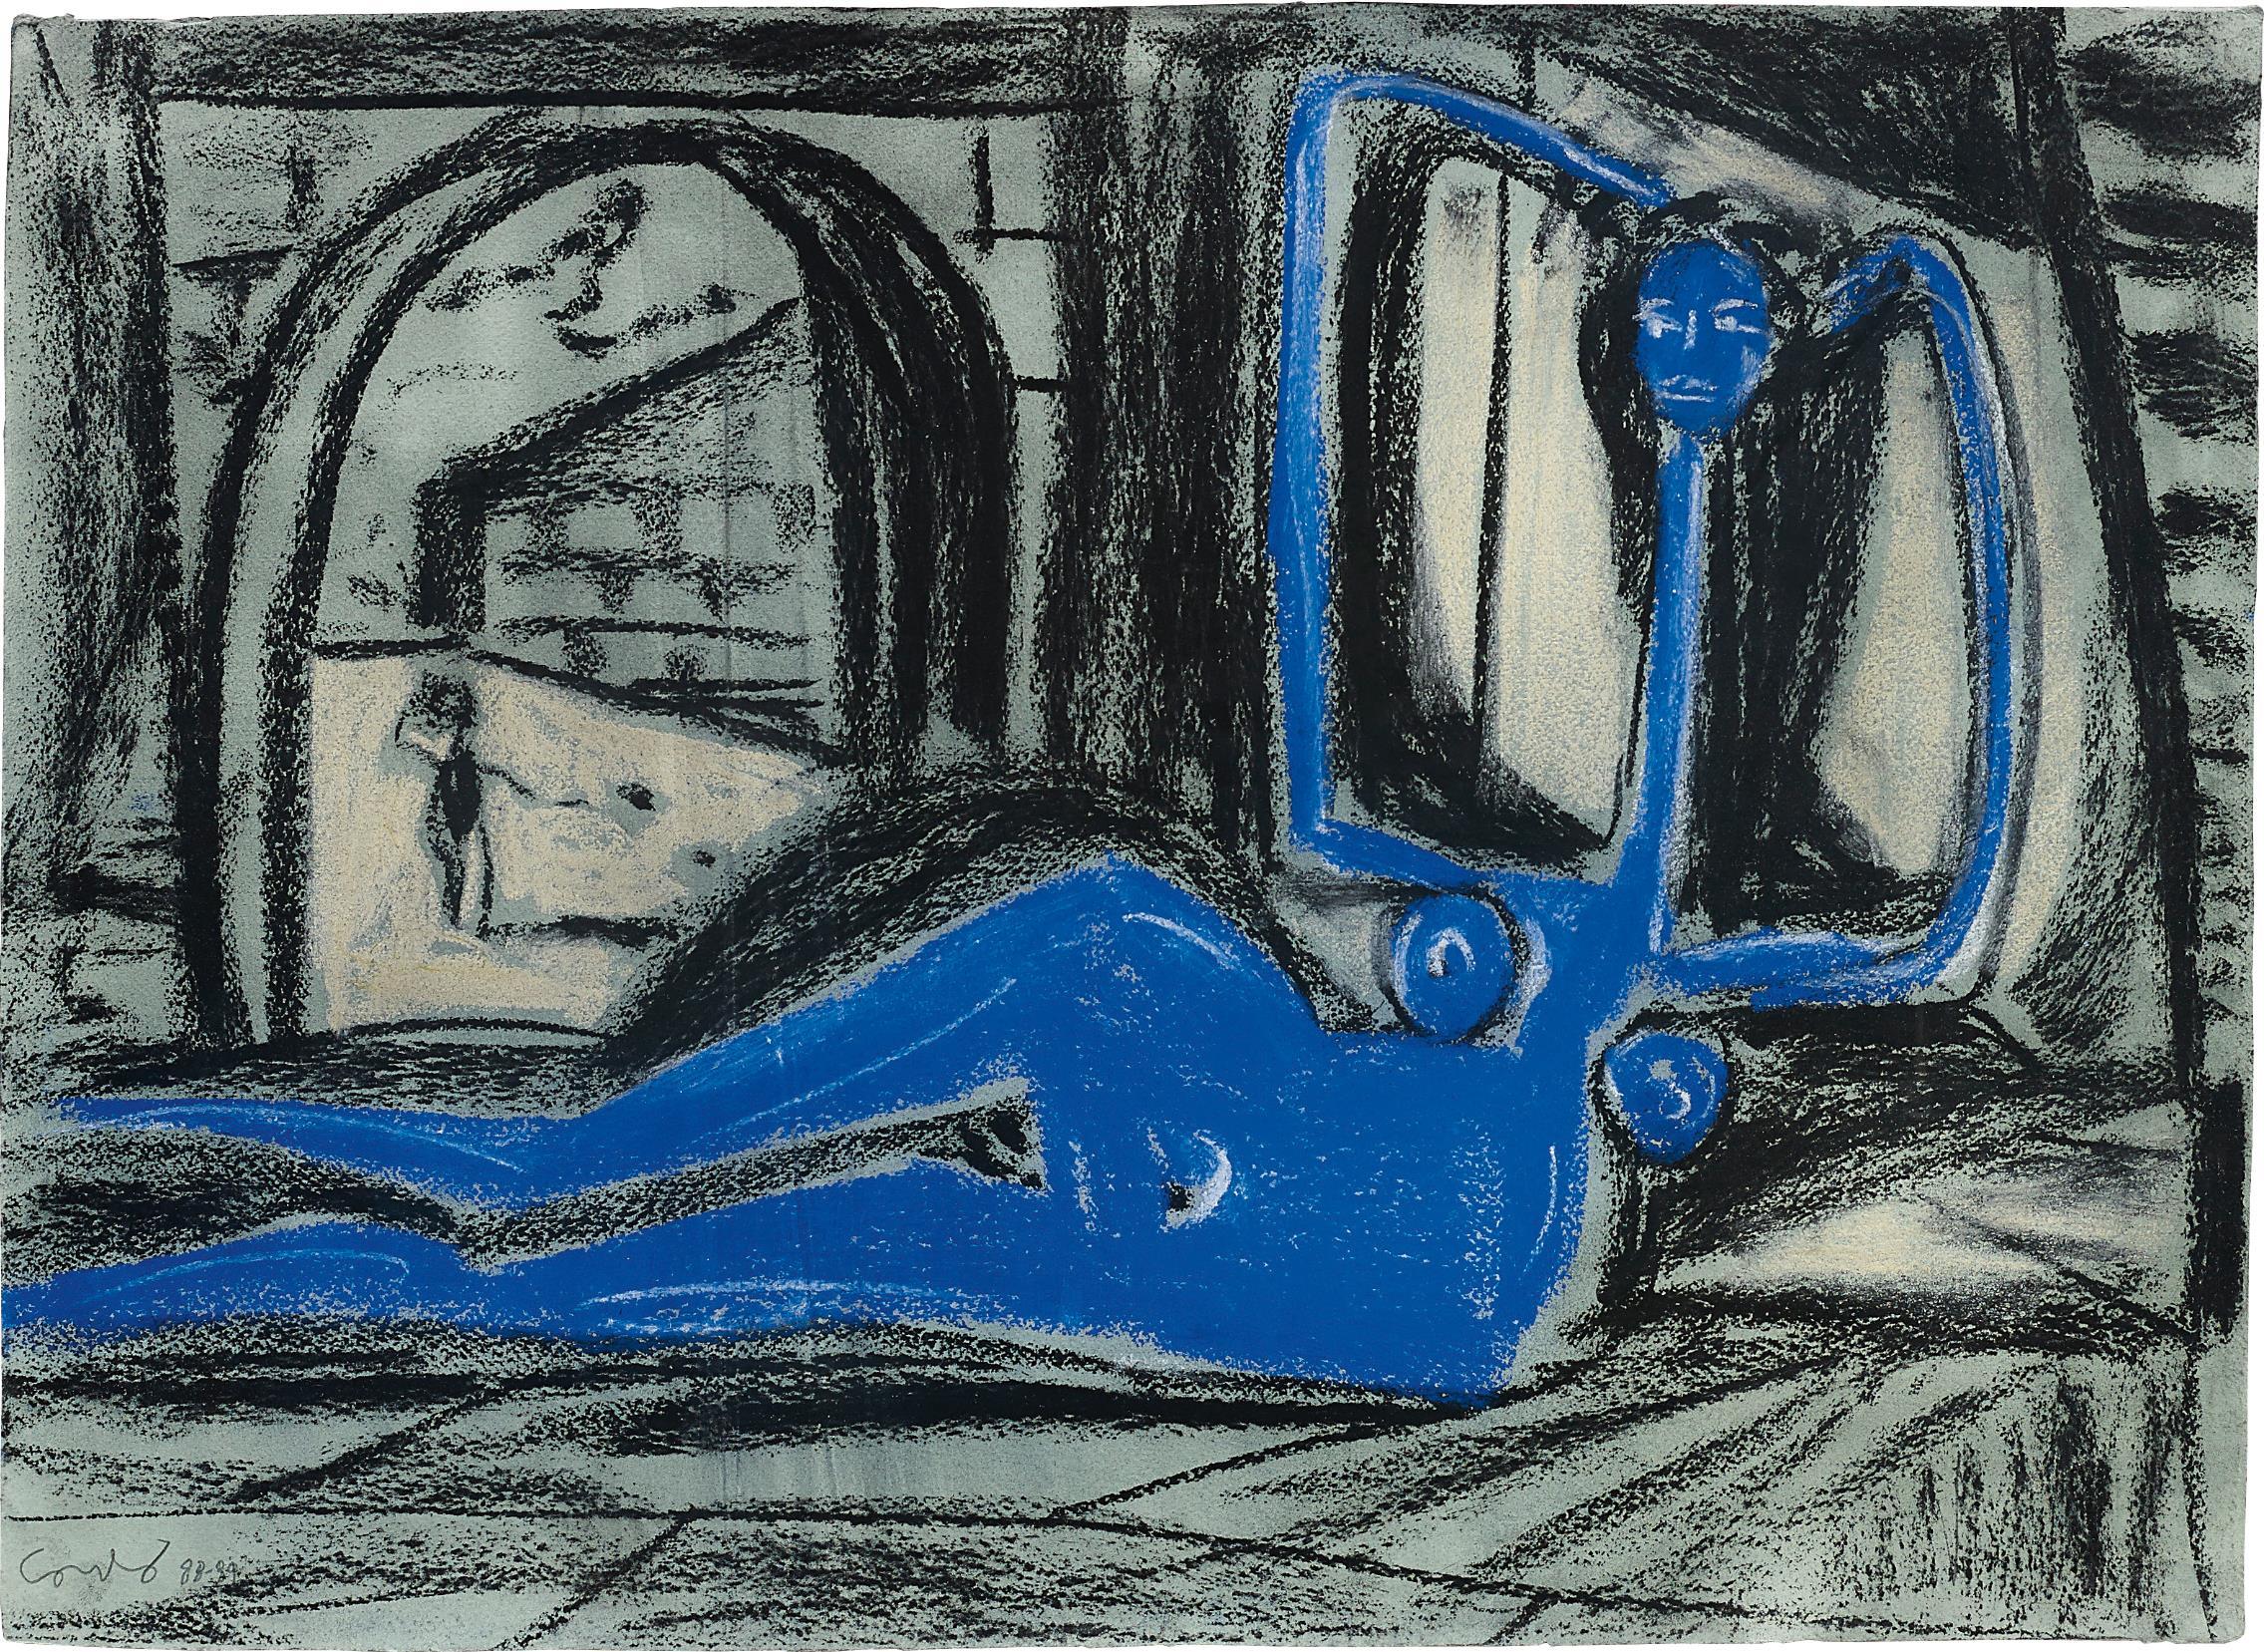 George Condo-Untitled-1989